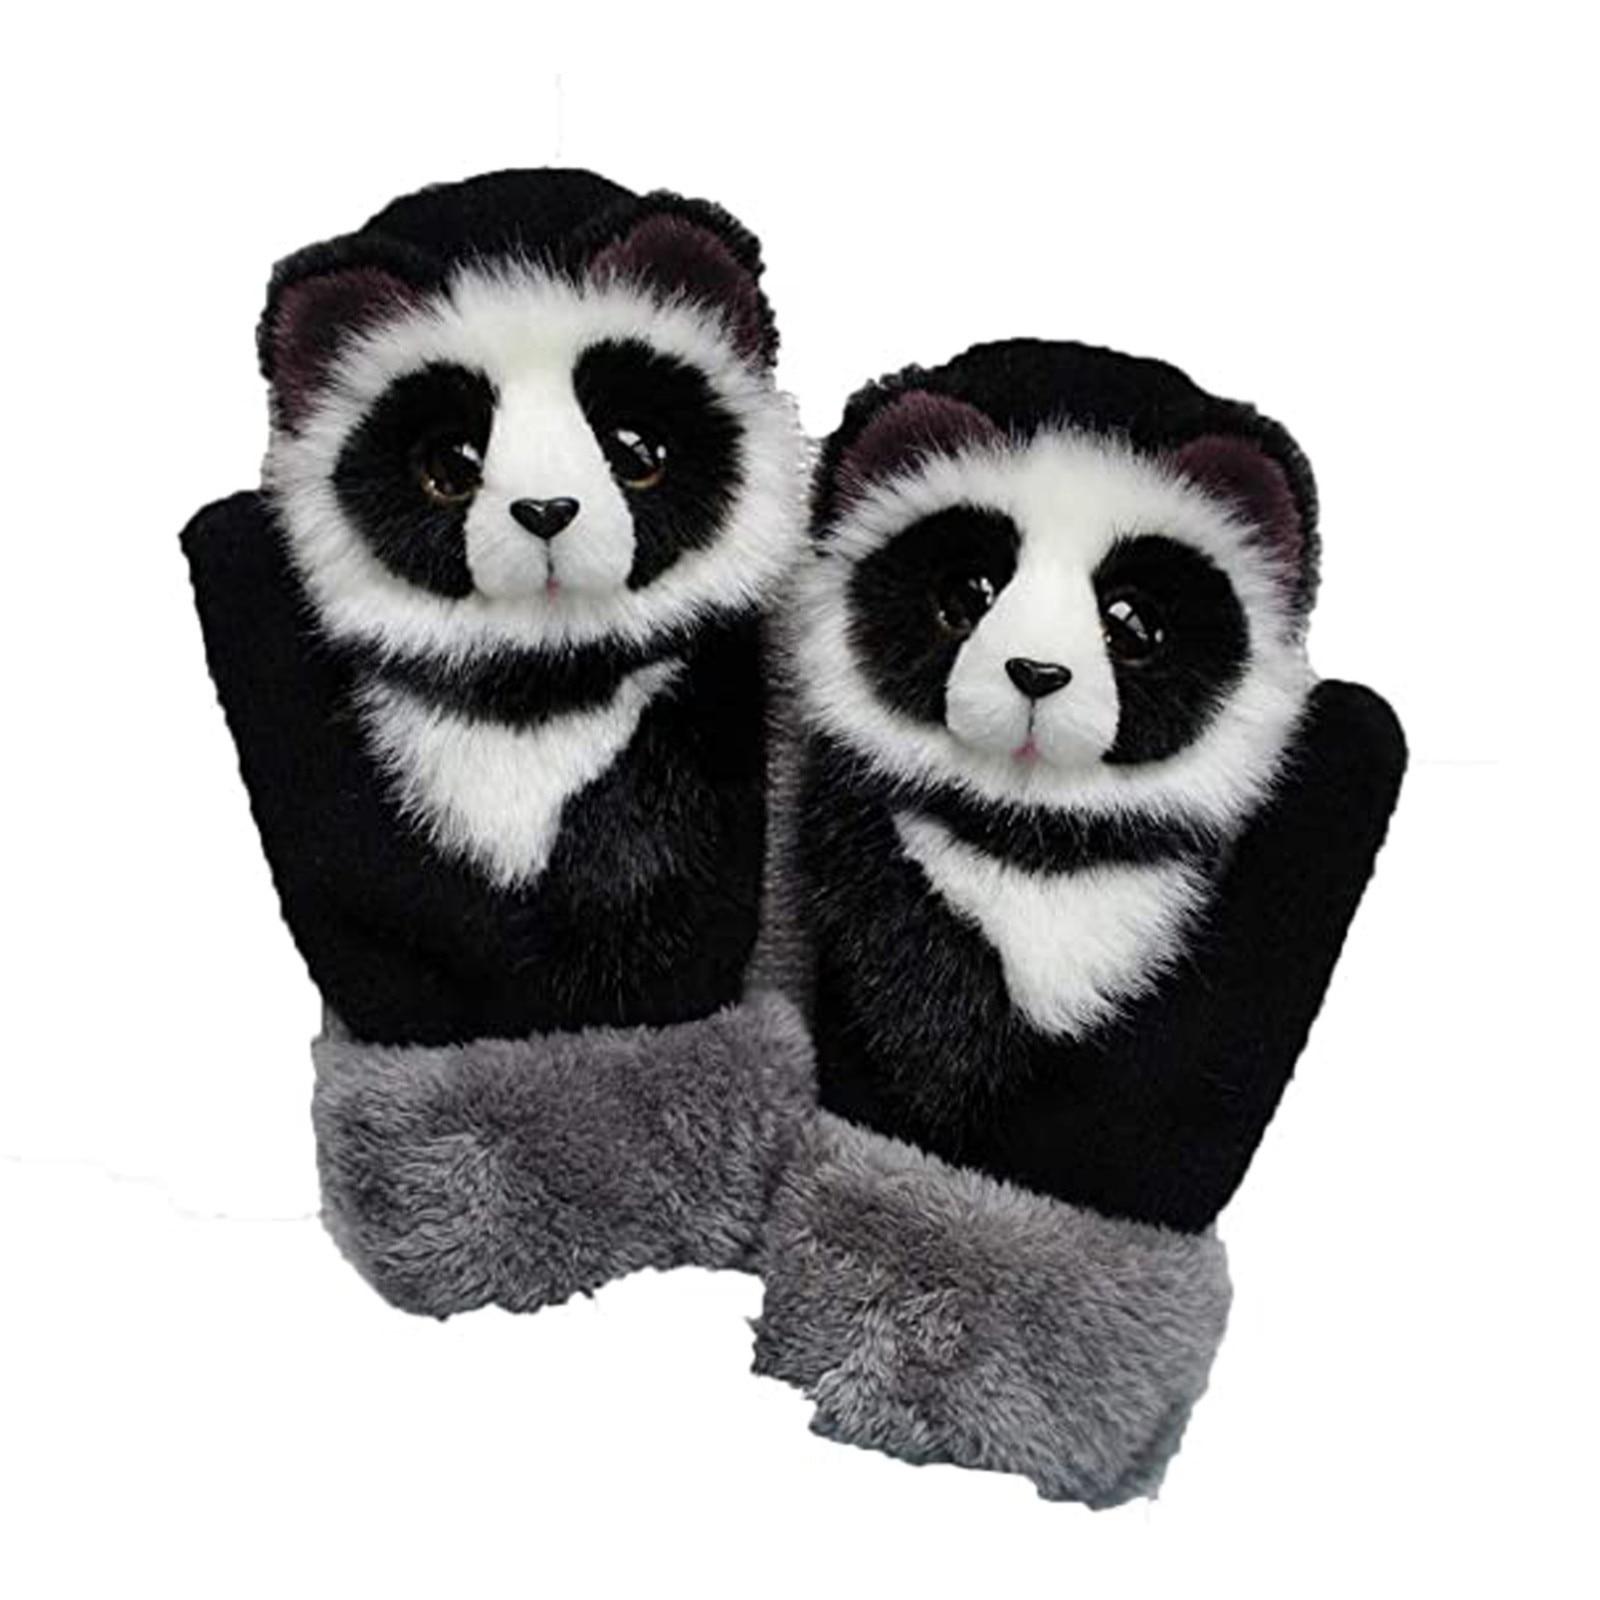 Cat Dog Panda Plus Velvet Thickened Gloves Winter Goves Mens Gloves Ladies And Child Gloves Thermo Fur Gloves Finger Mittens 1